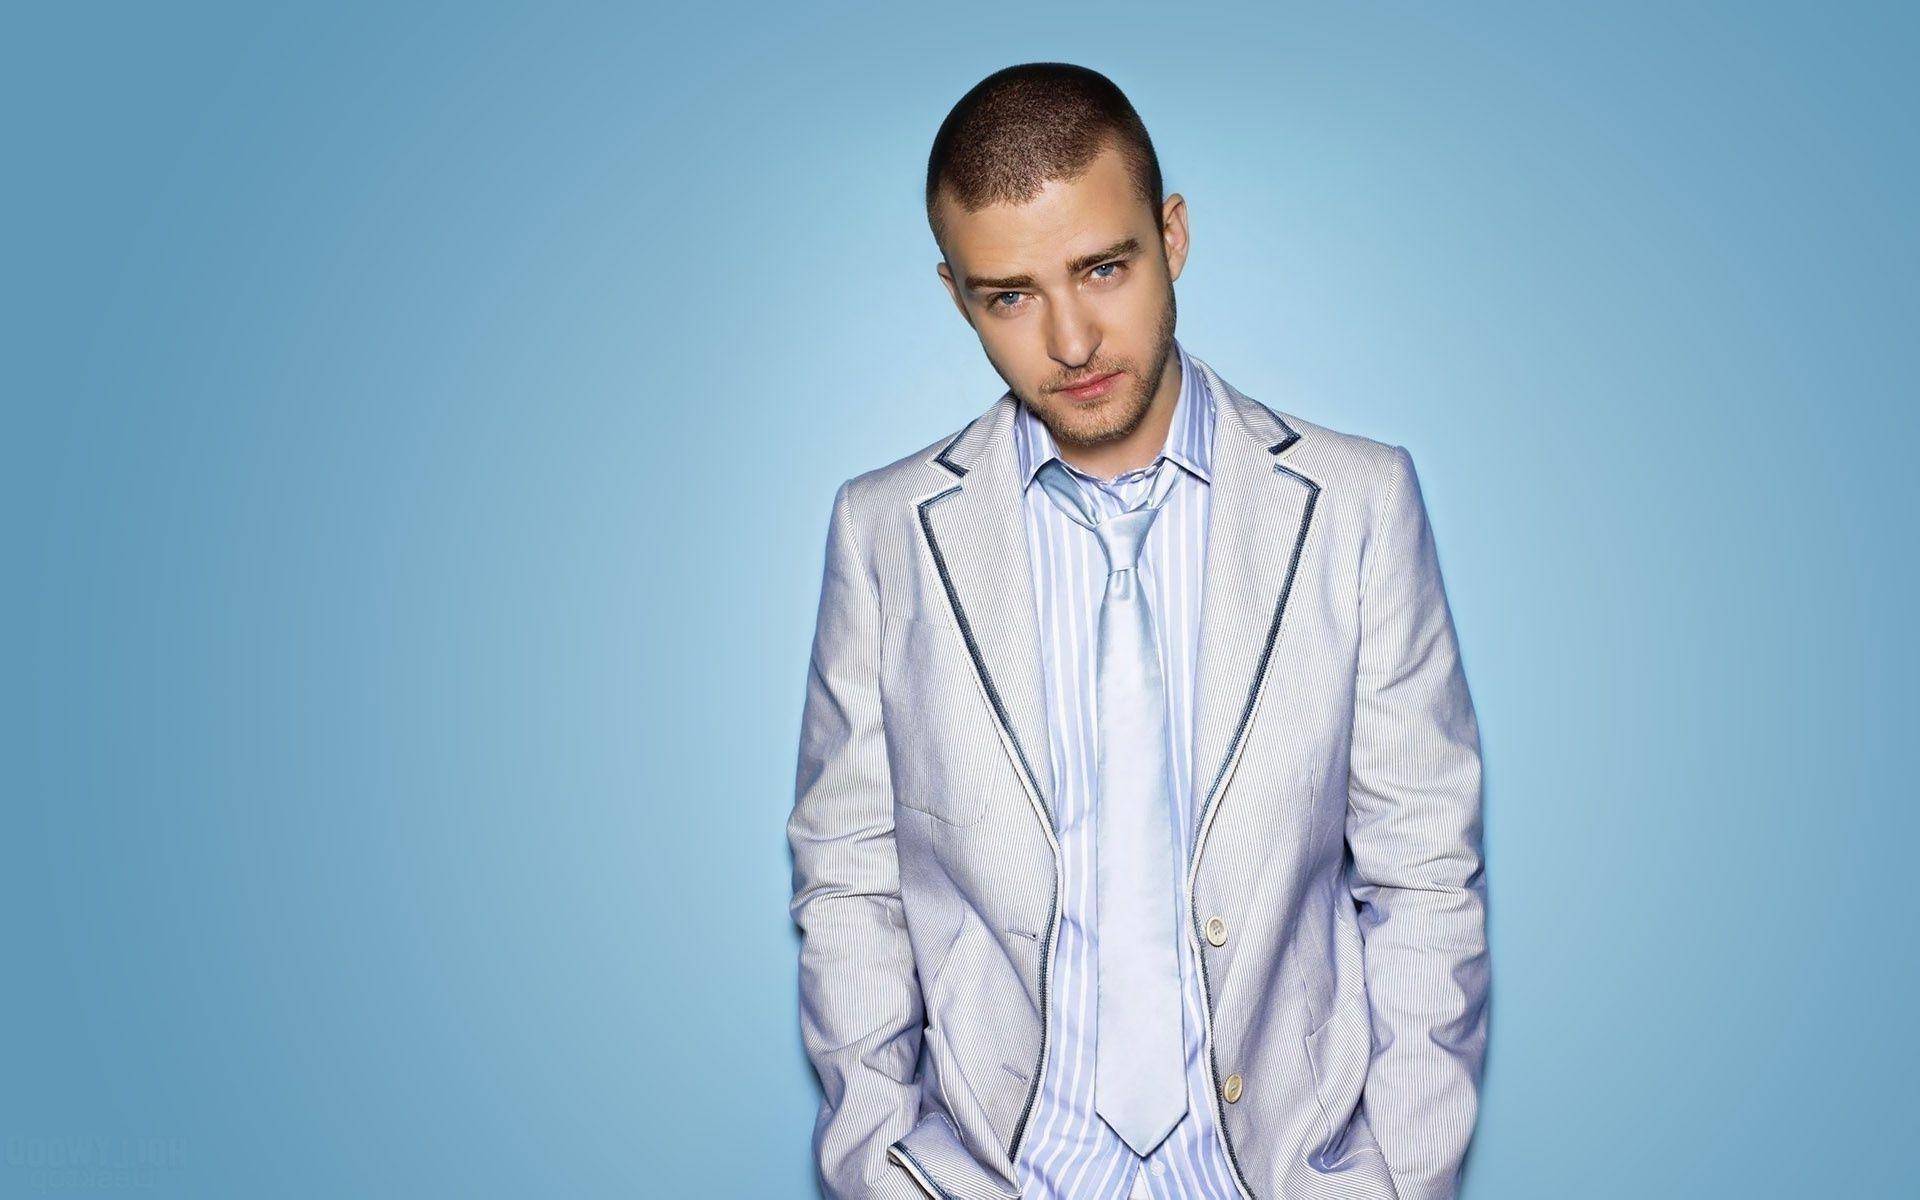 Justin Timberlake Wallpaper Actor Wallpaper Justin Timberlak